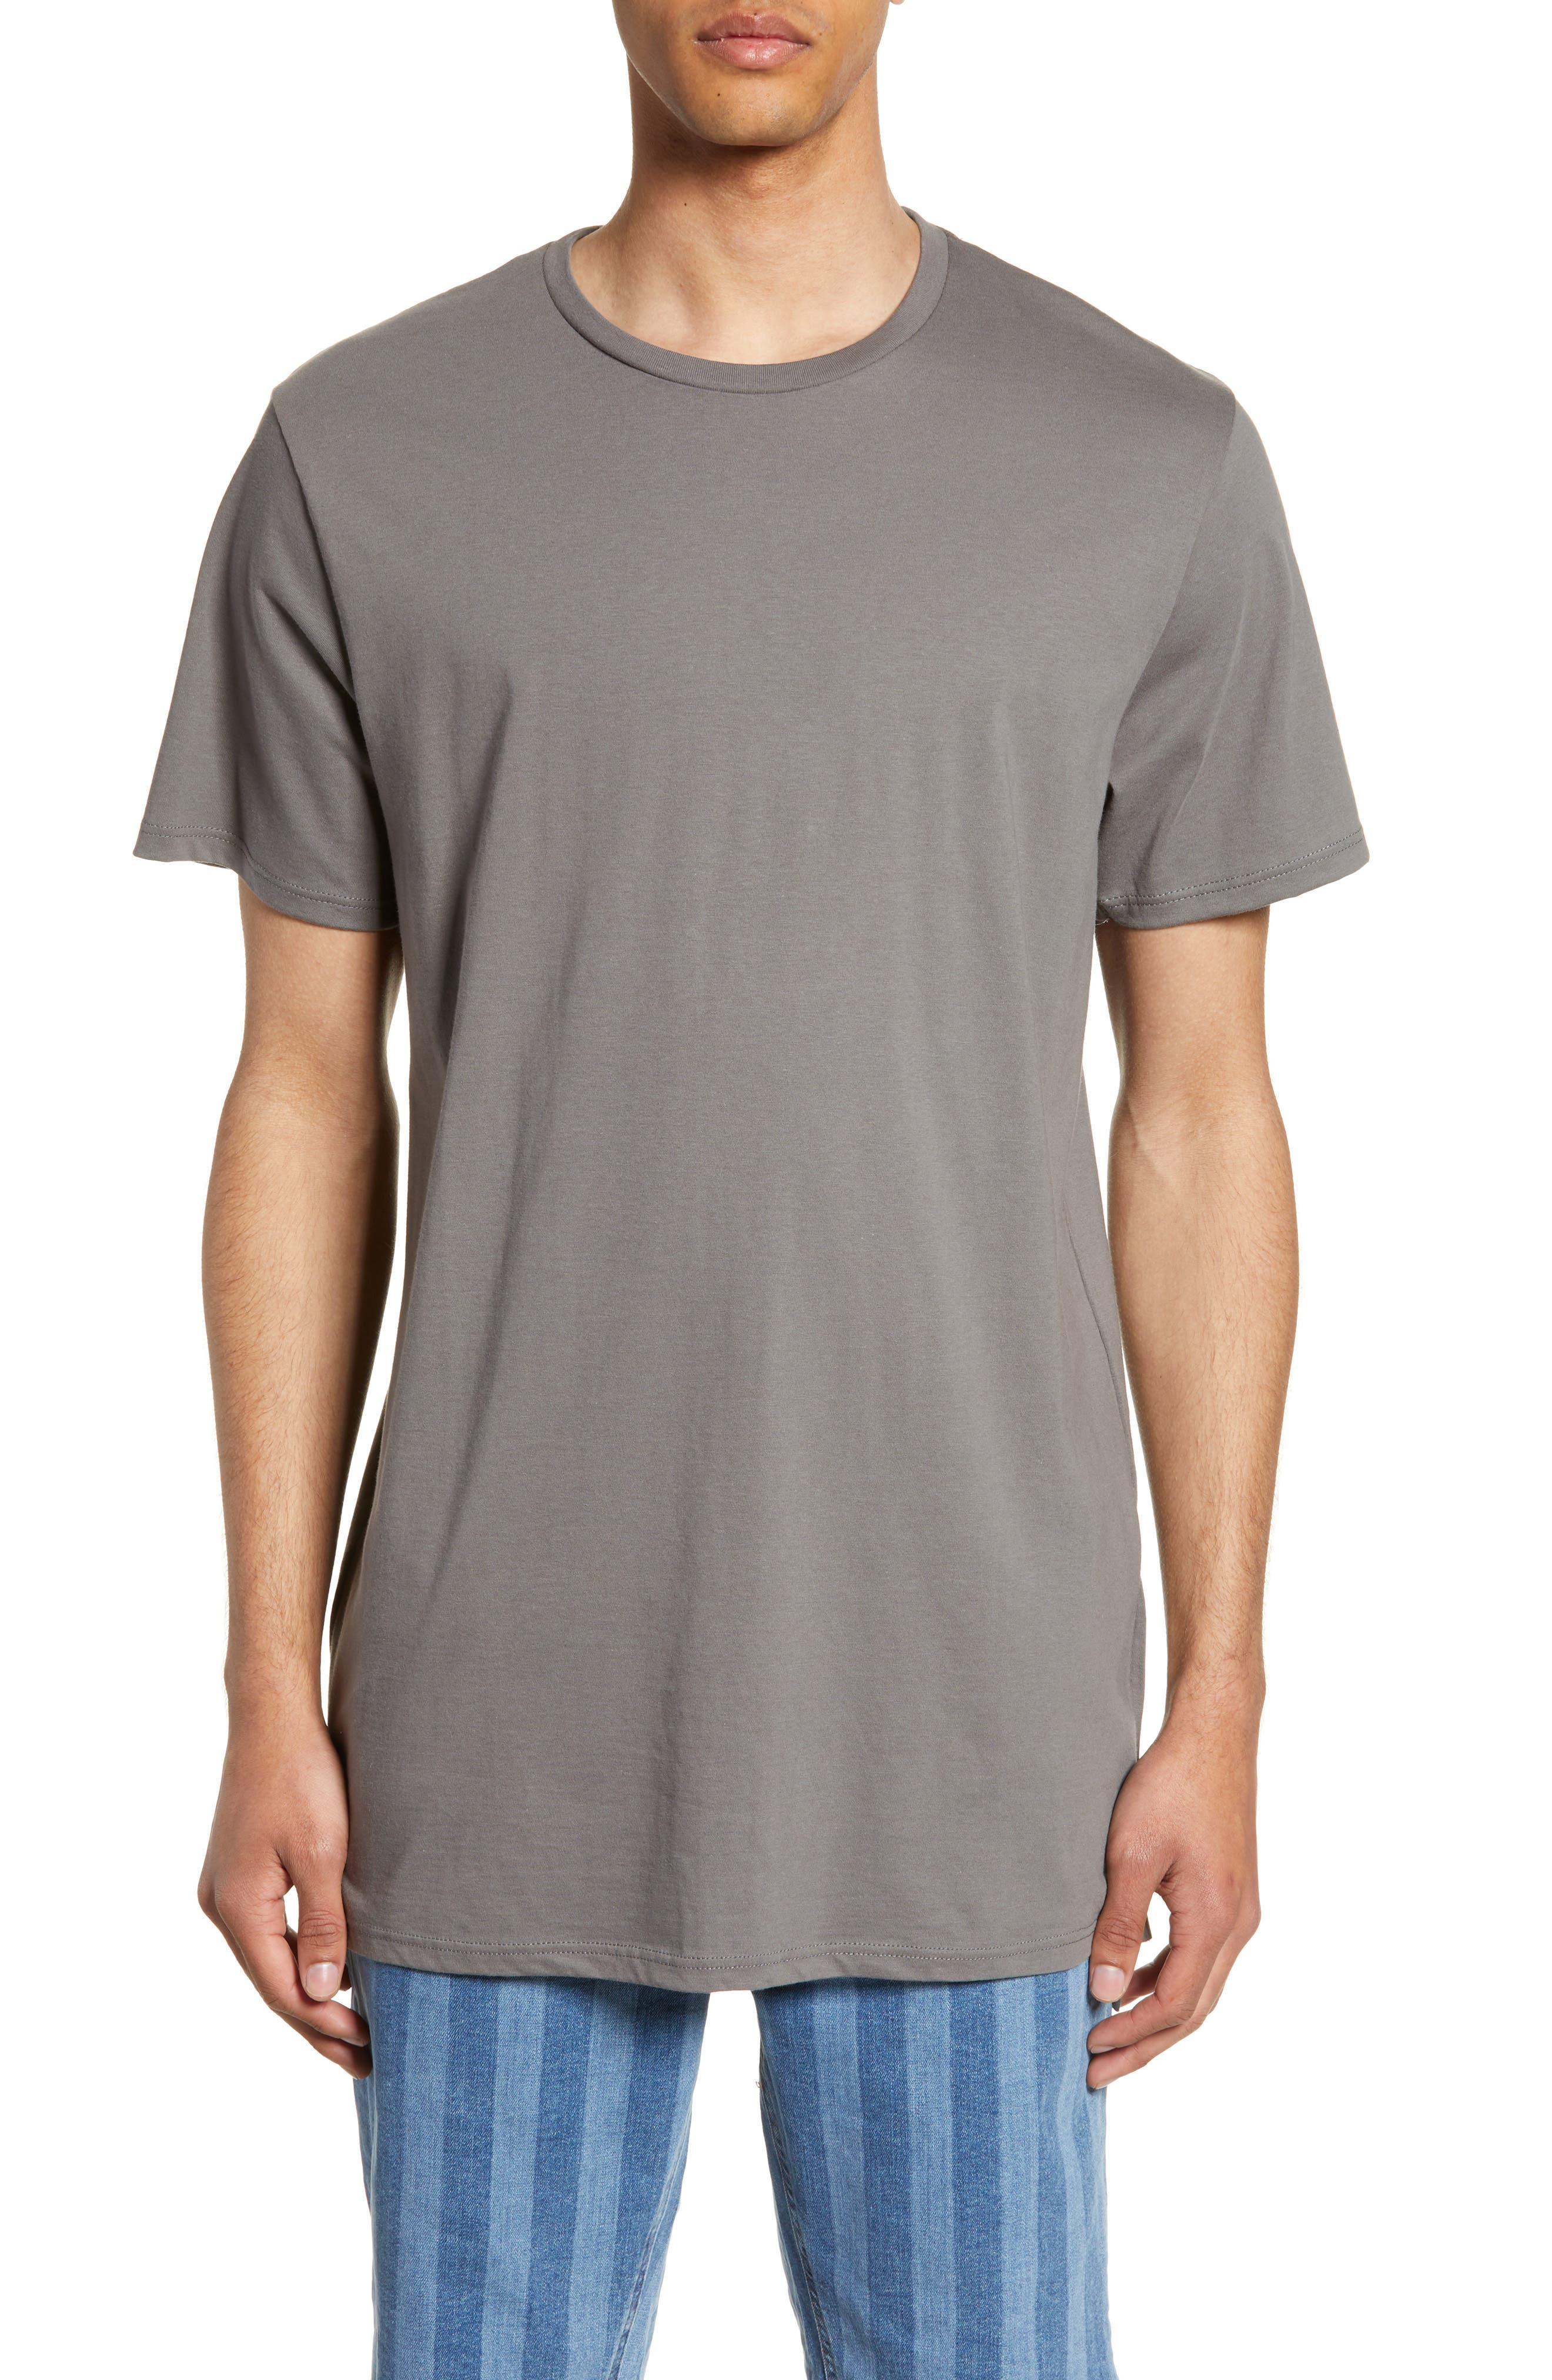 TOPMAN, Longline T-Shirt, Main thumbnail 1, color, GREY